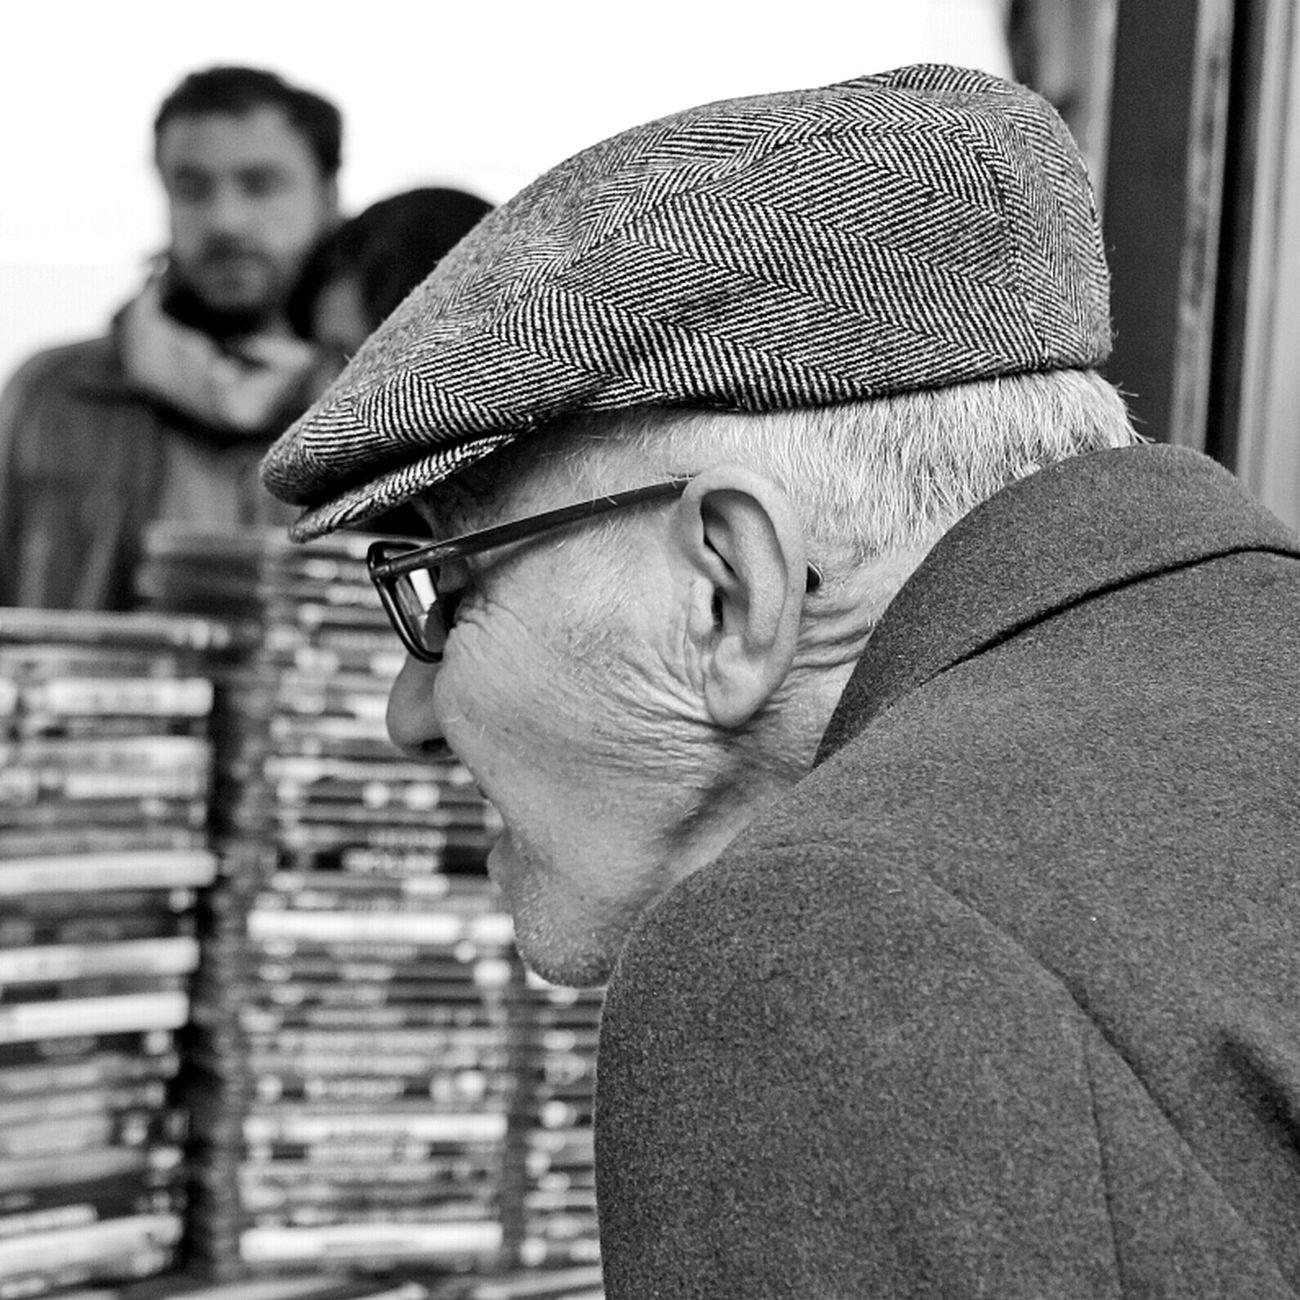 Streetphotography Street Photography Portrait Street Life Portraits Street Portrait On The Streets Streetphoto_bw Bws_worldwide